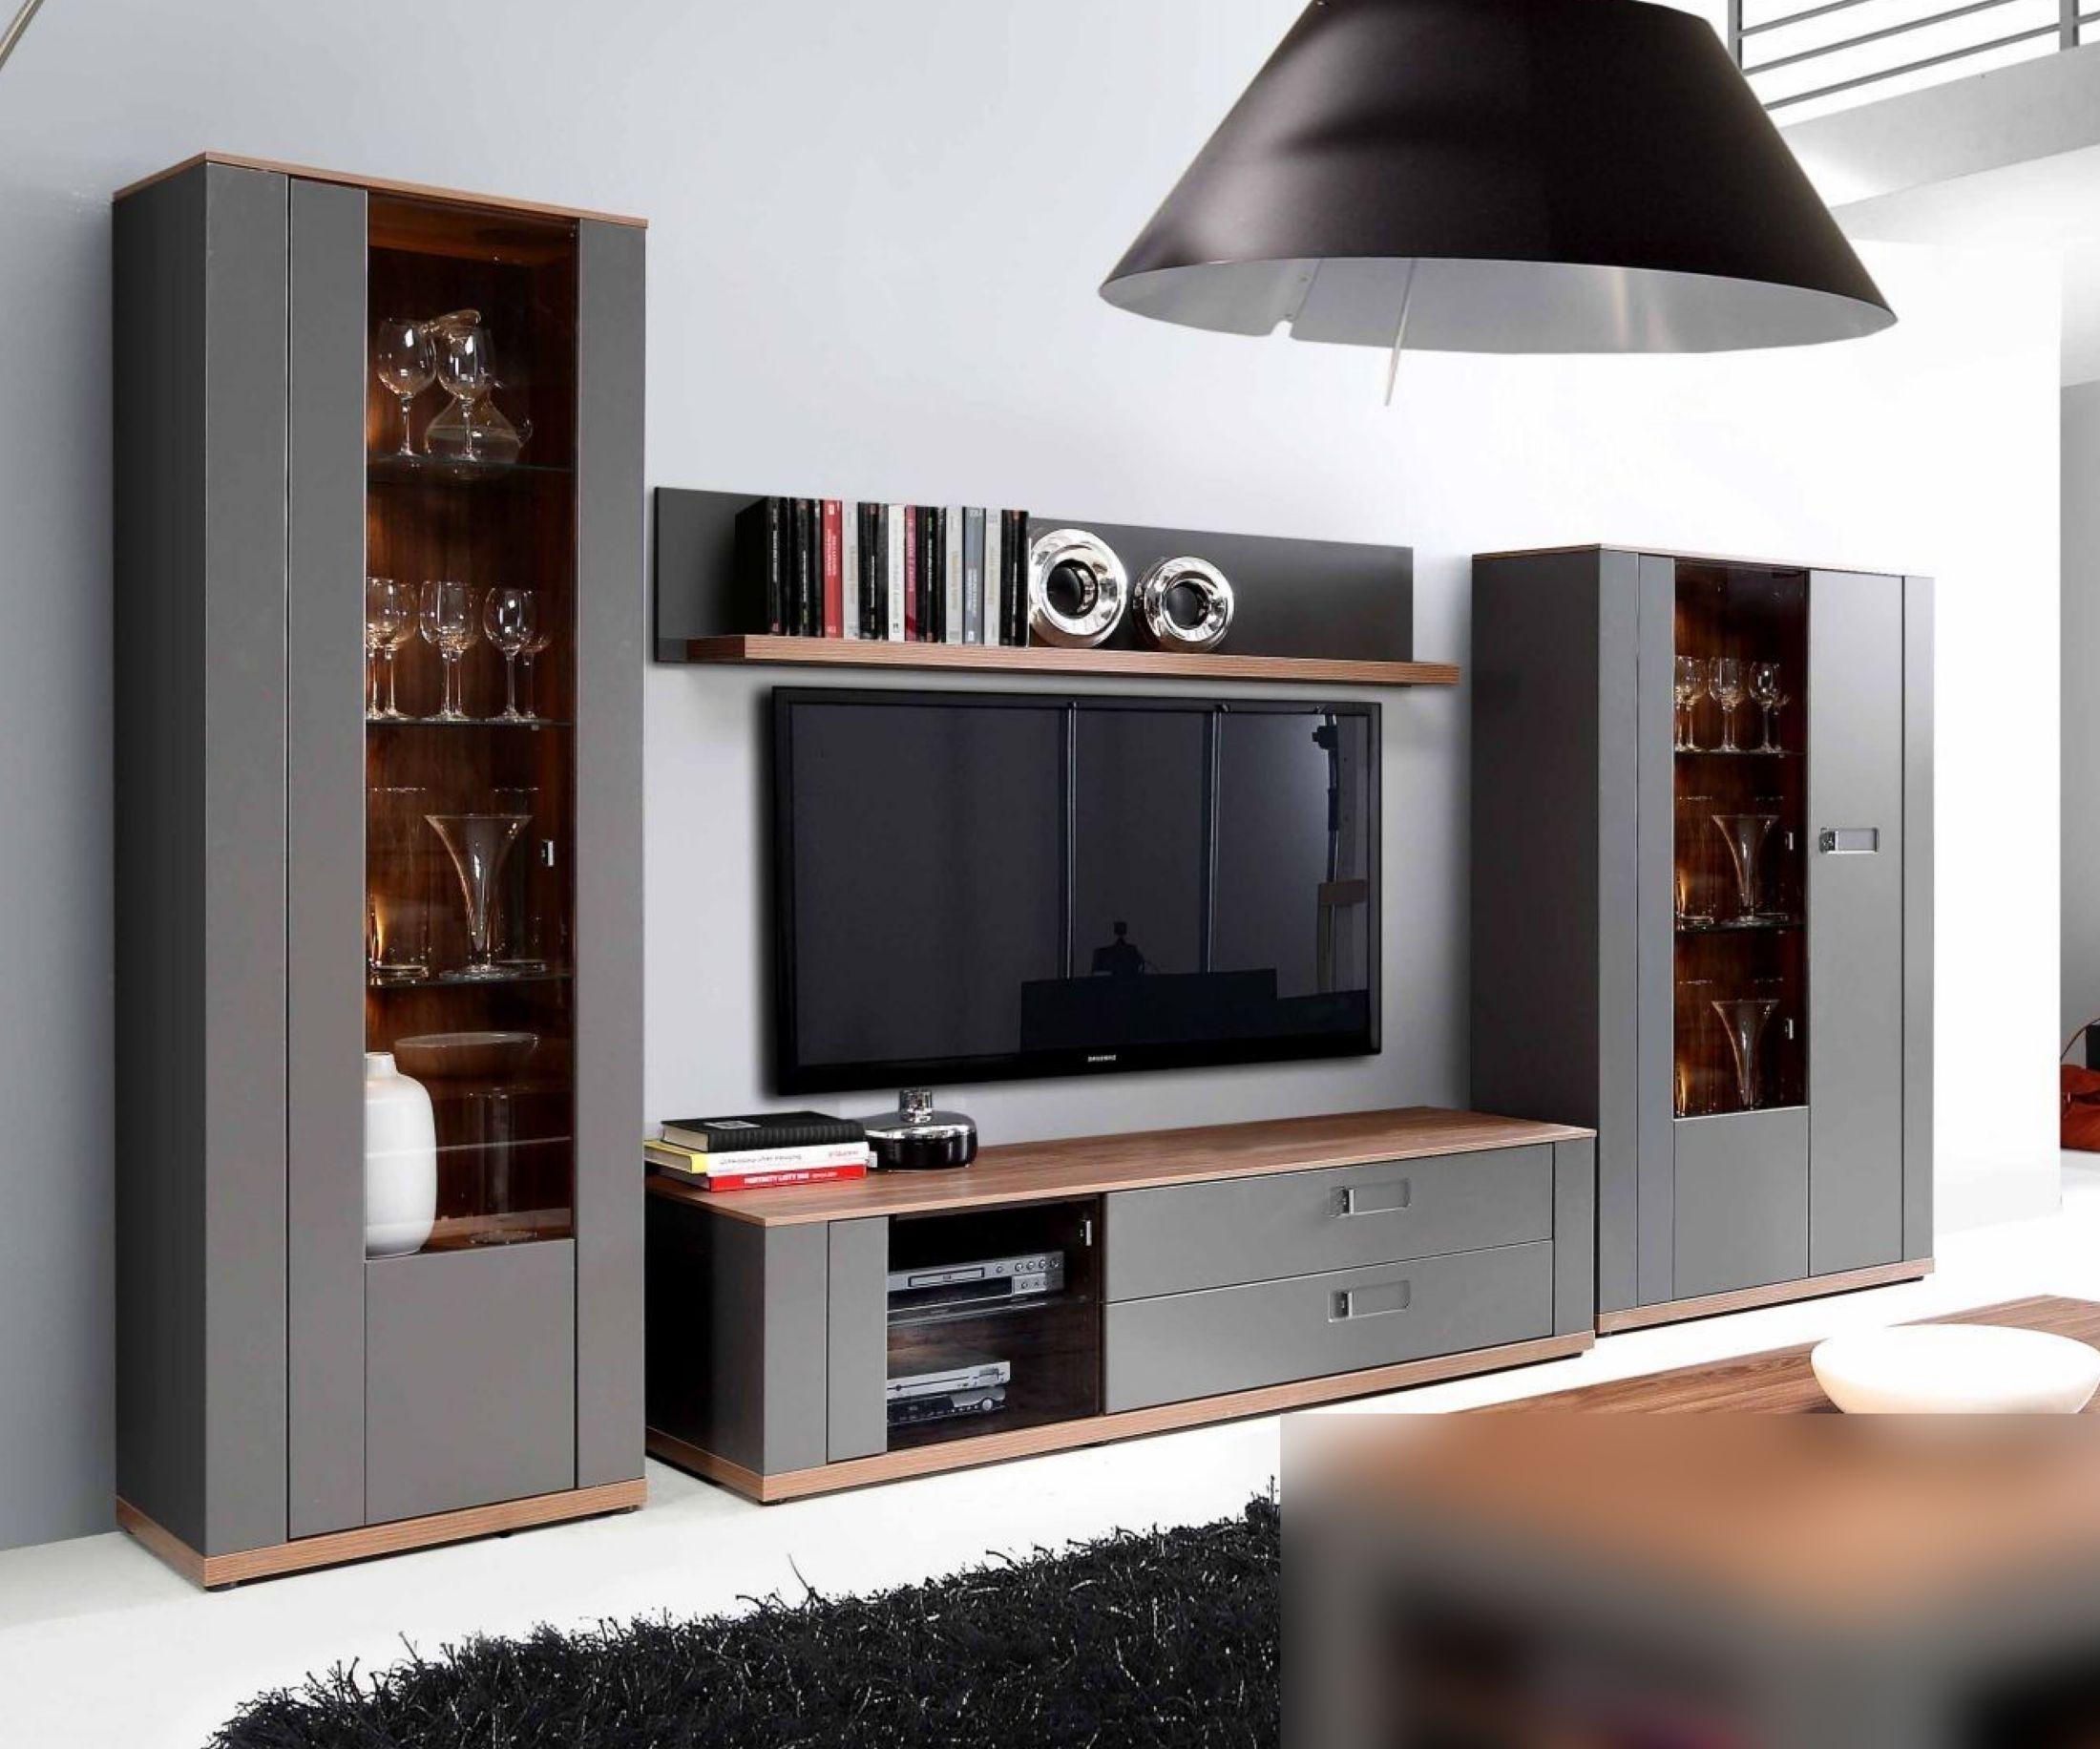 Wohnwand Grau Matt ~ Wohnwand in grau matt und sangallo eiche woody 77 00823 holz modern